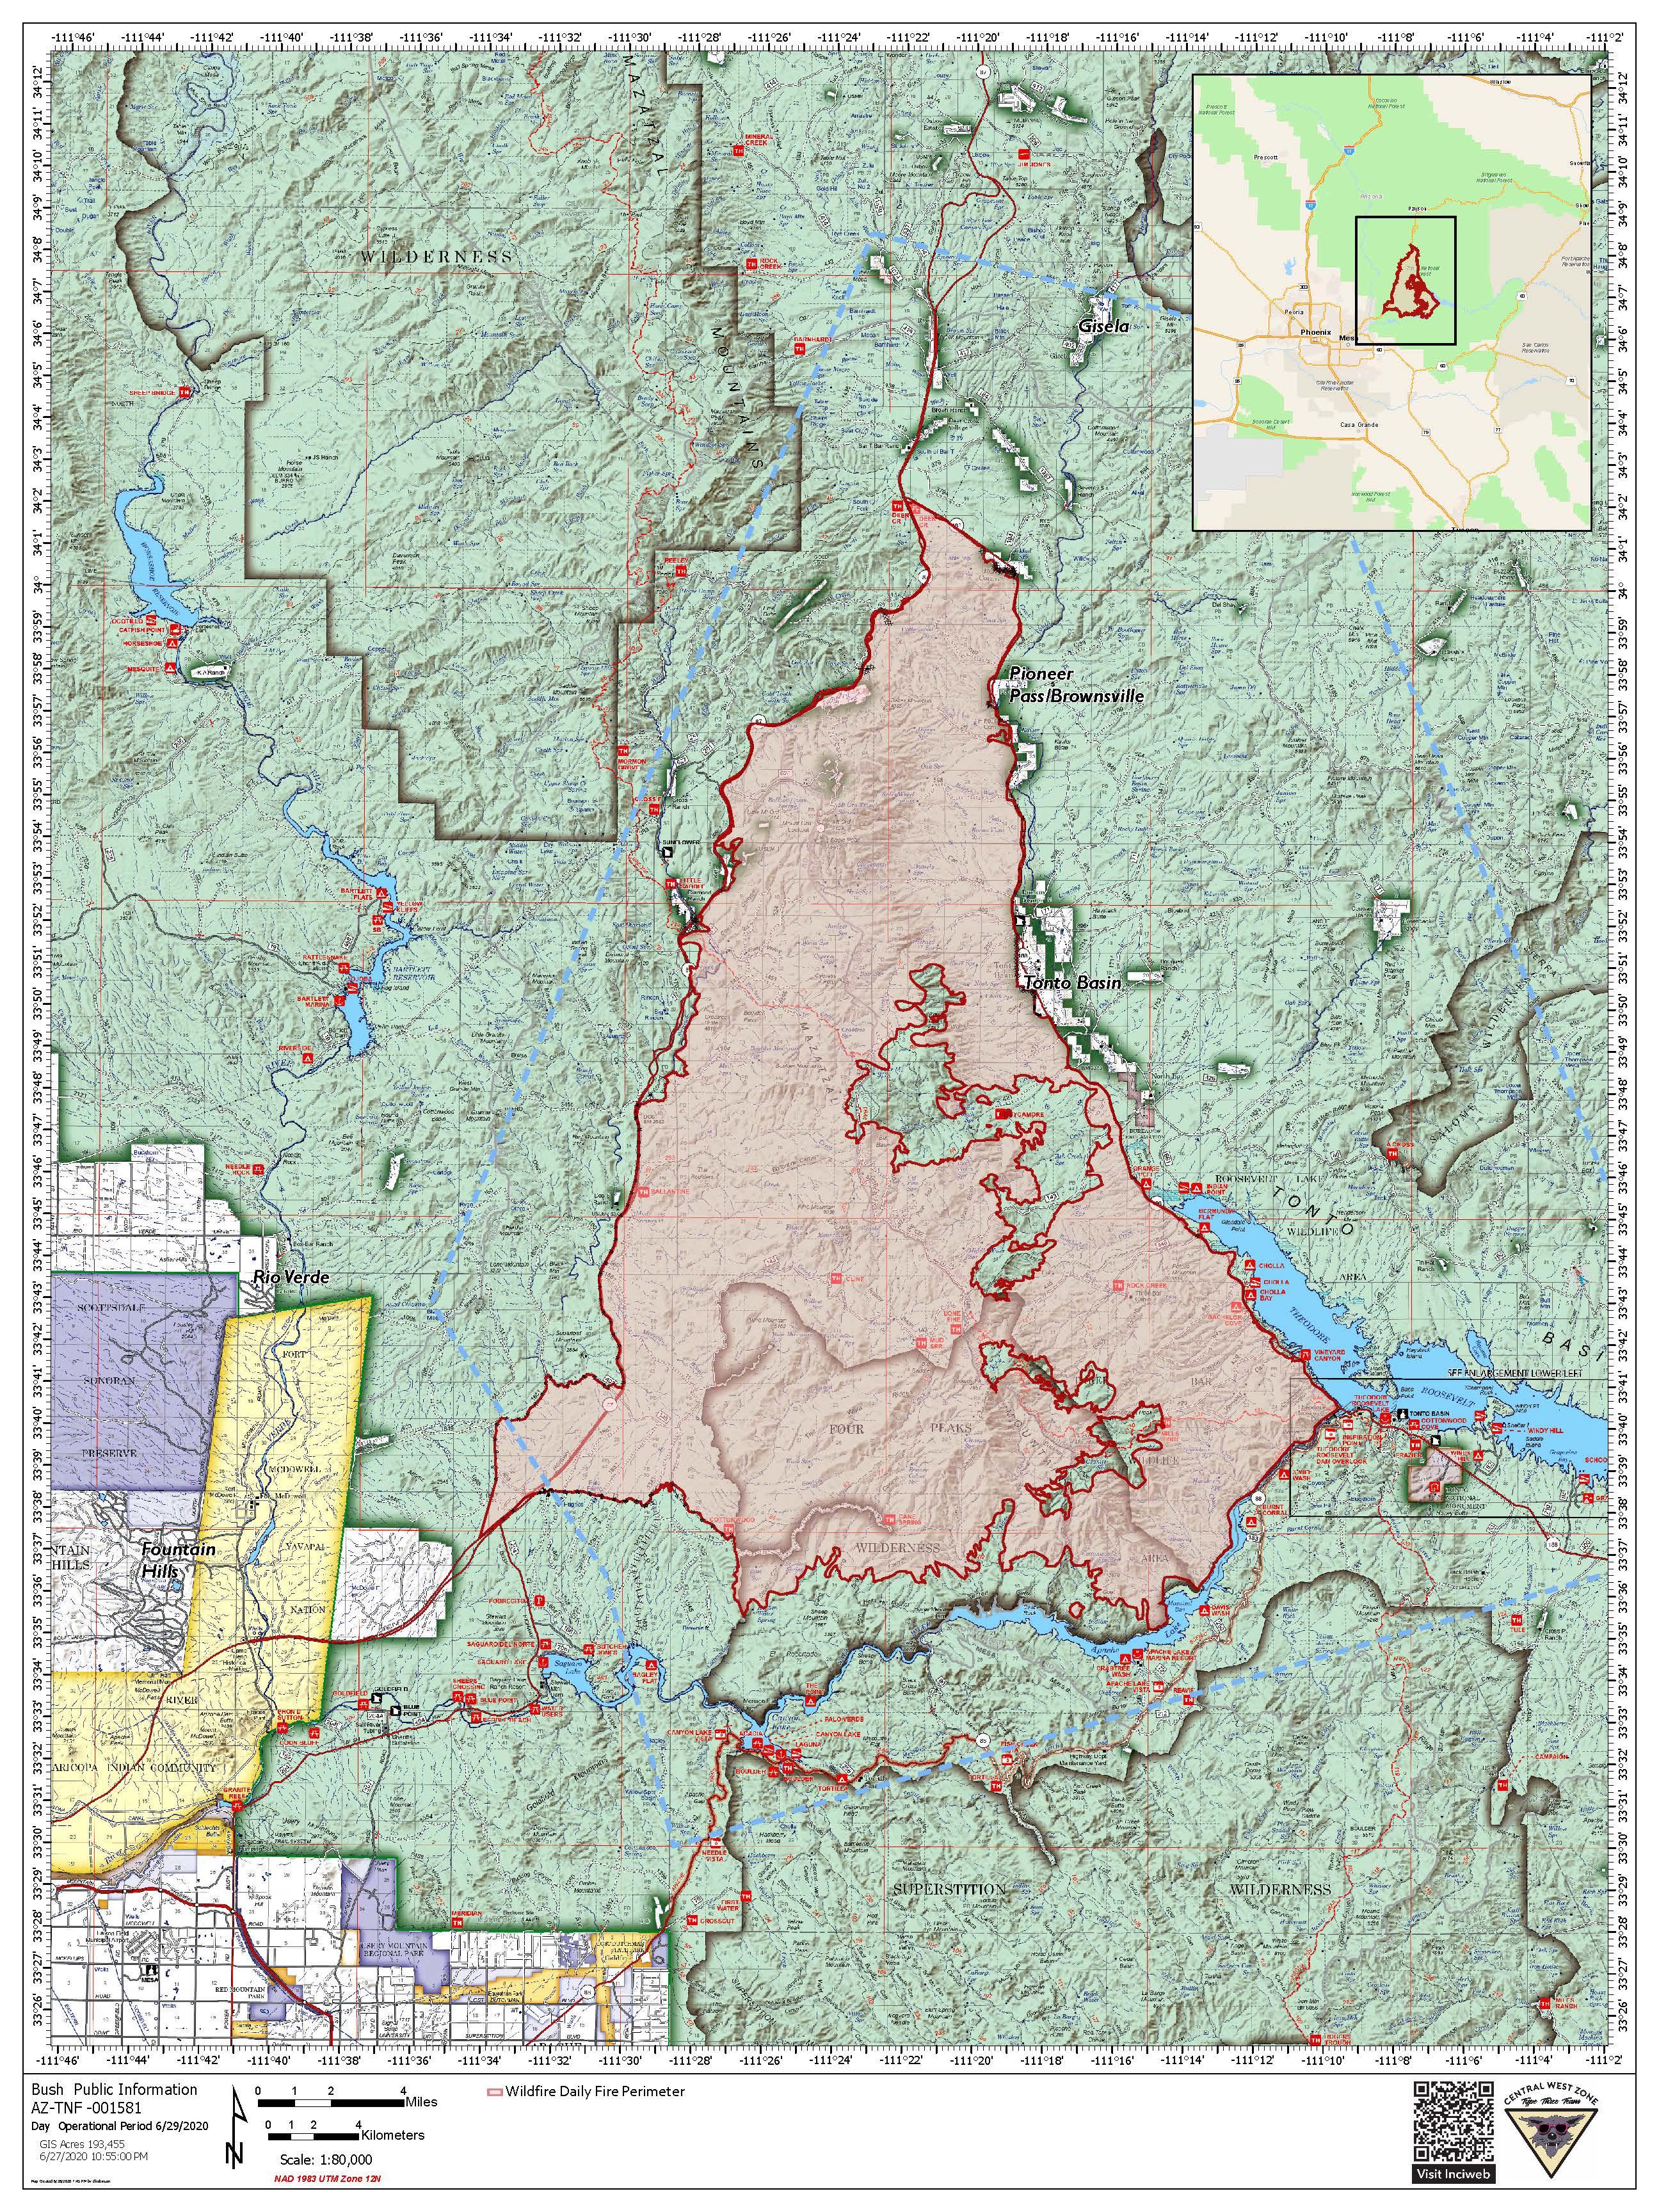 Bush Fire Map 6-29-20